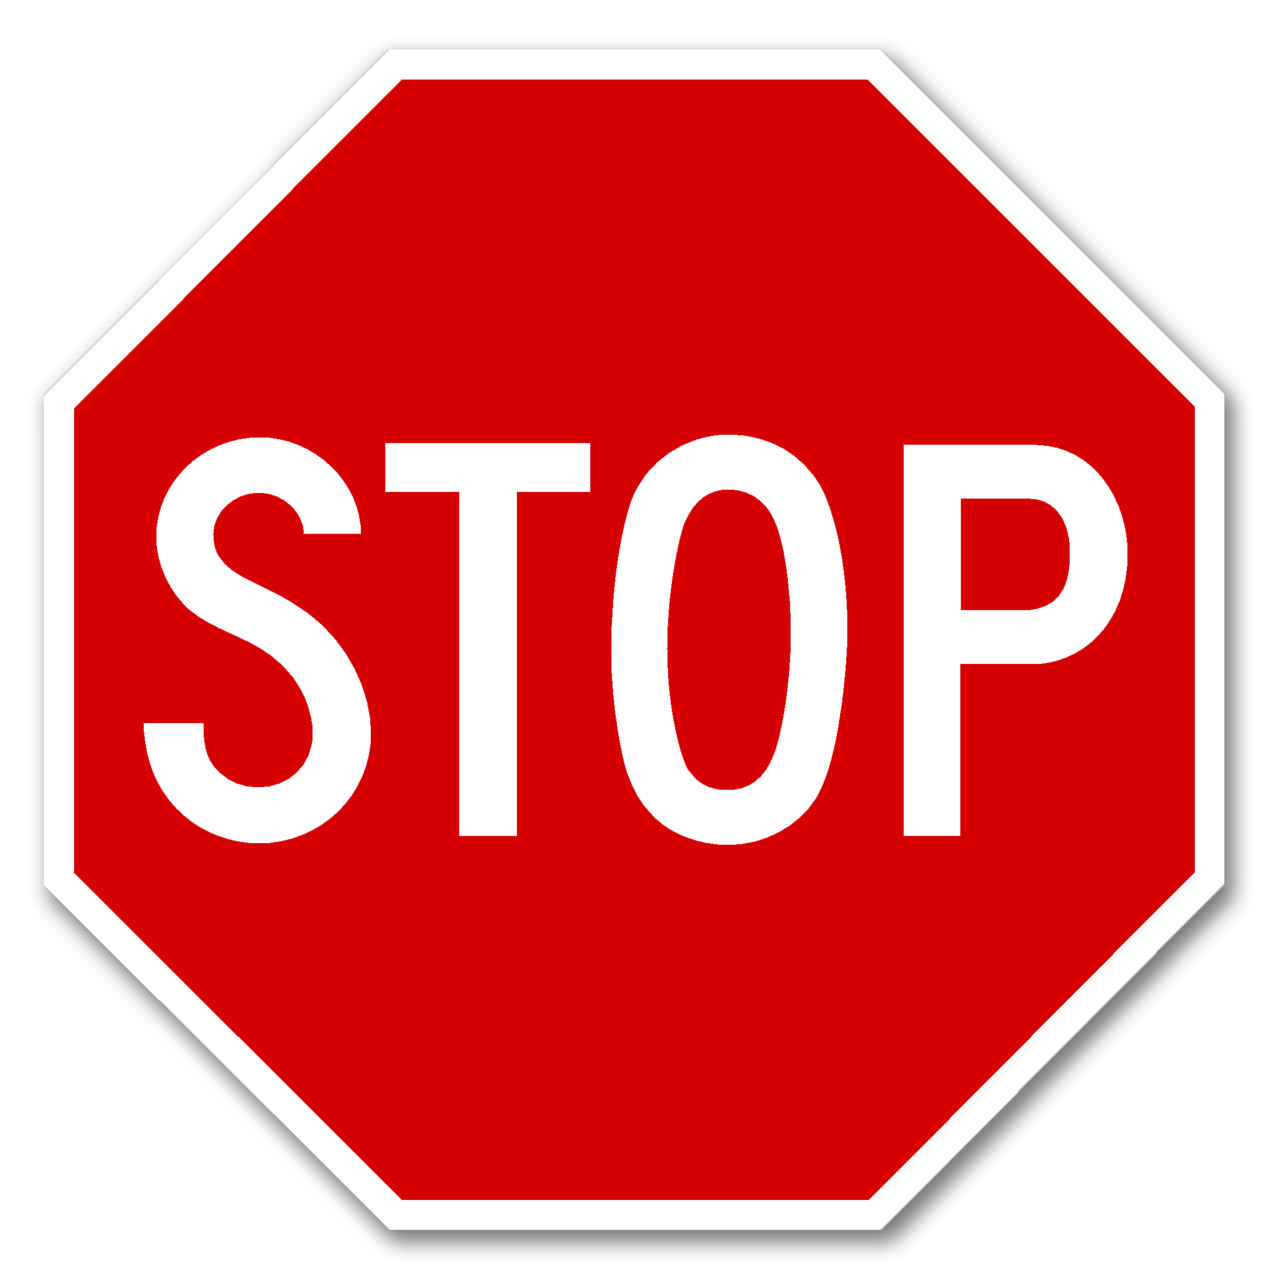 Stop Sign Car Vetto Flash Kontak V8206 R7 15m Universal Sni R1 1 Dornbos Safety Inc